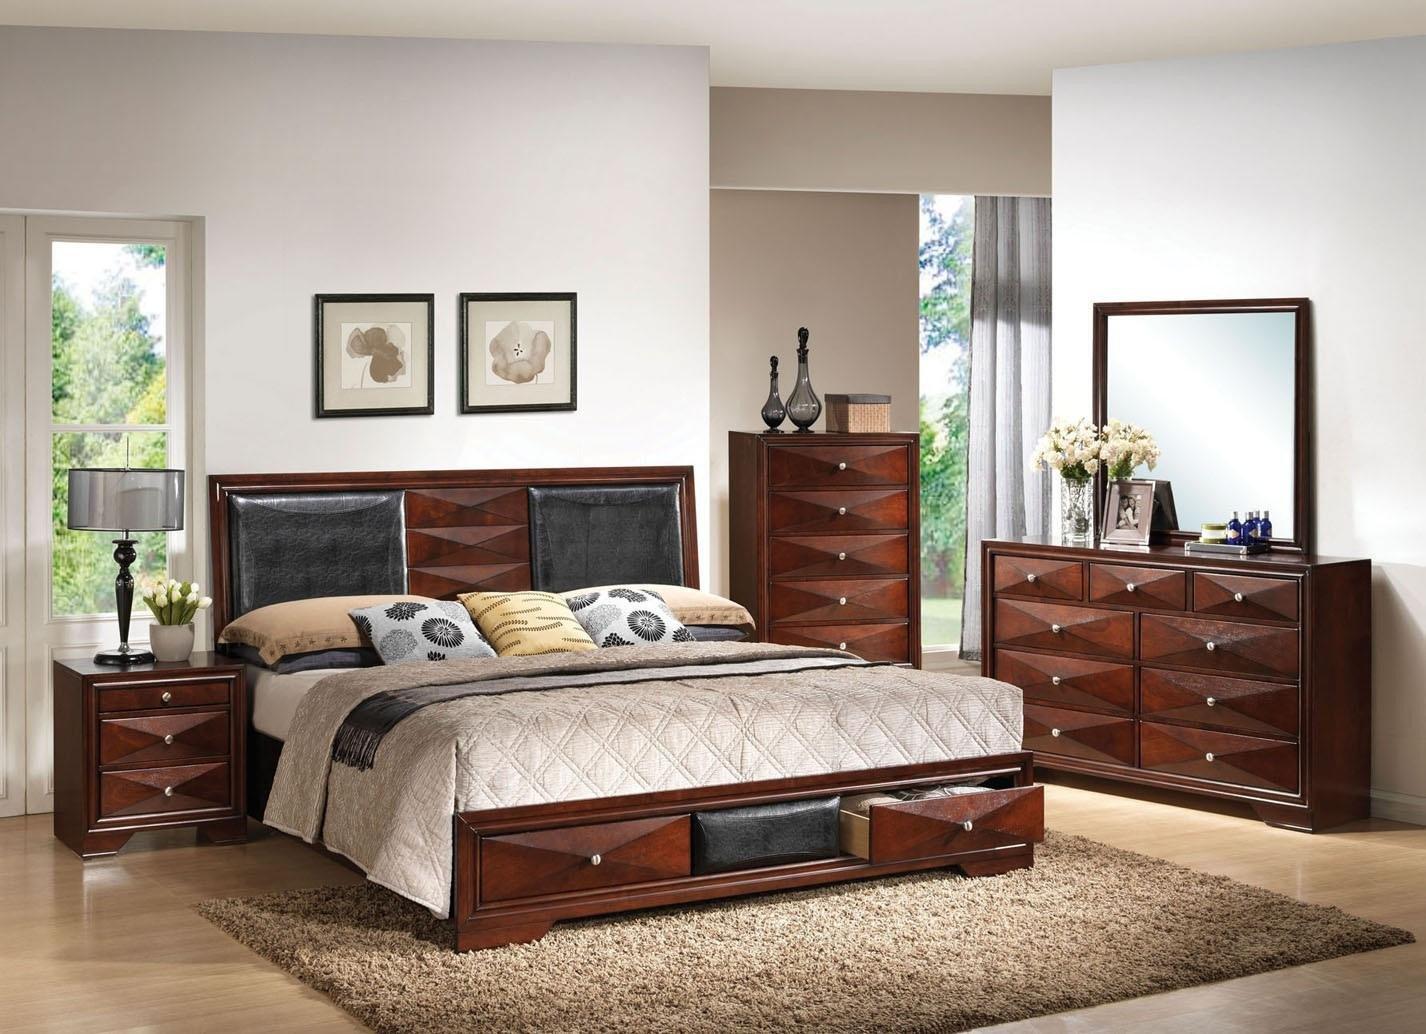 Acme Furniture Bedroom Set Inspirational Acme Furniture Windsor 5 Piece Bedroom Set